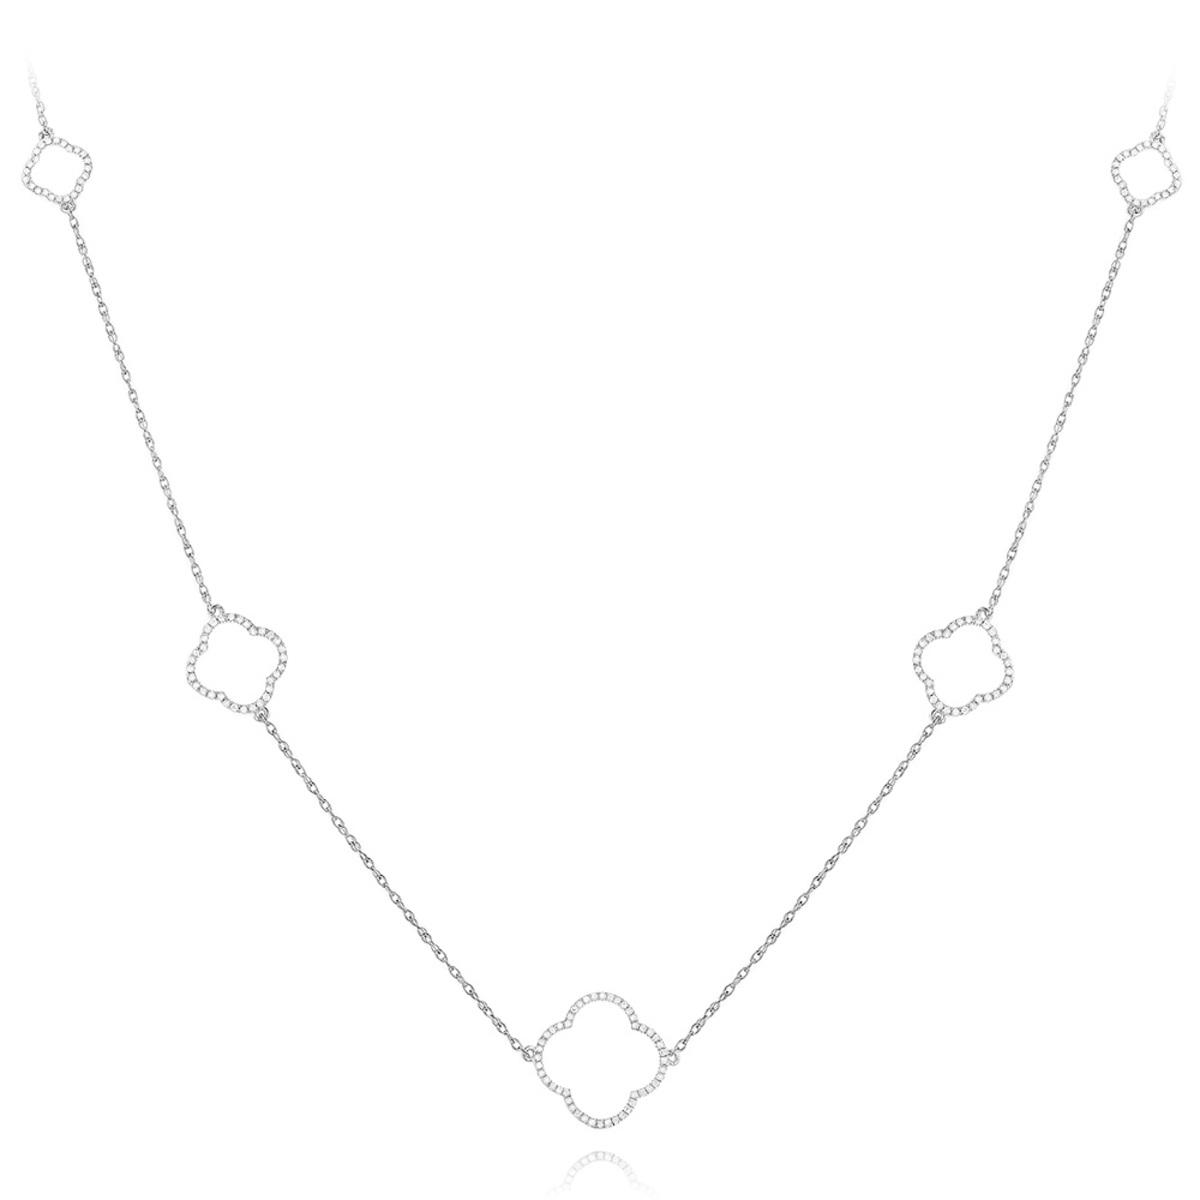 Alhambra Jewelry 14K Gold Ladies Diamond Necklace 1/3ct